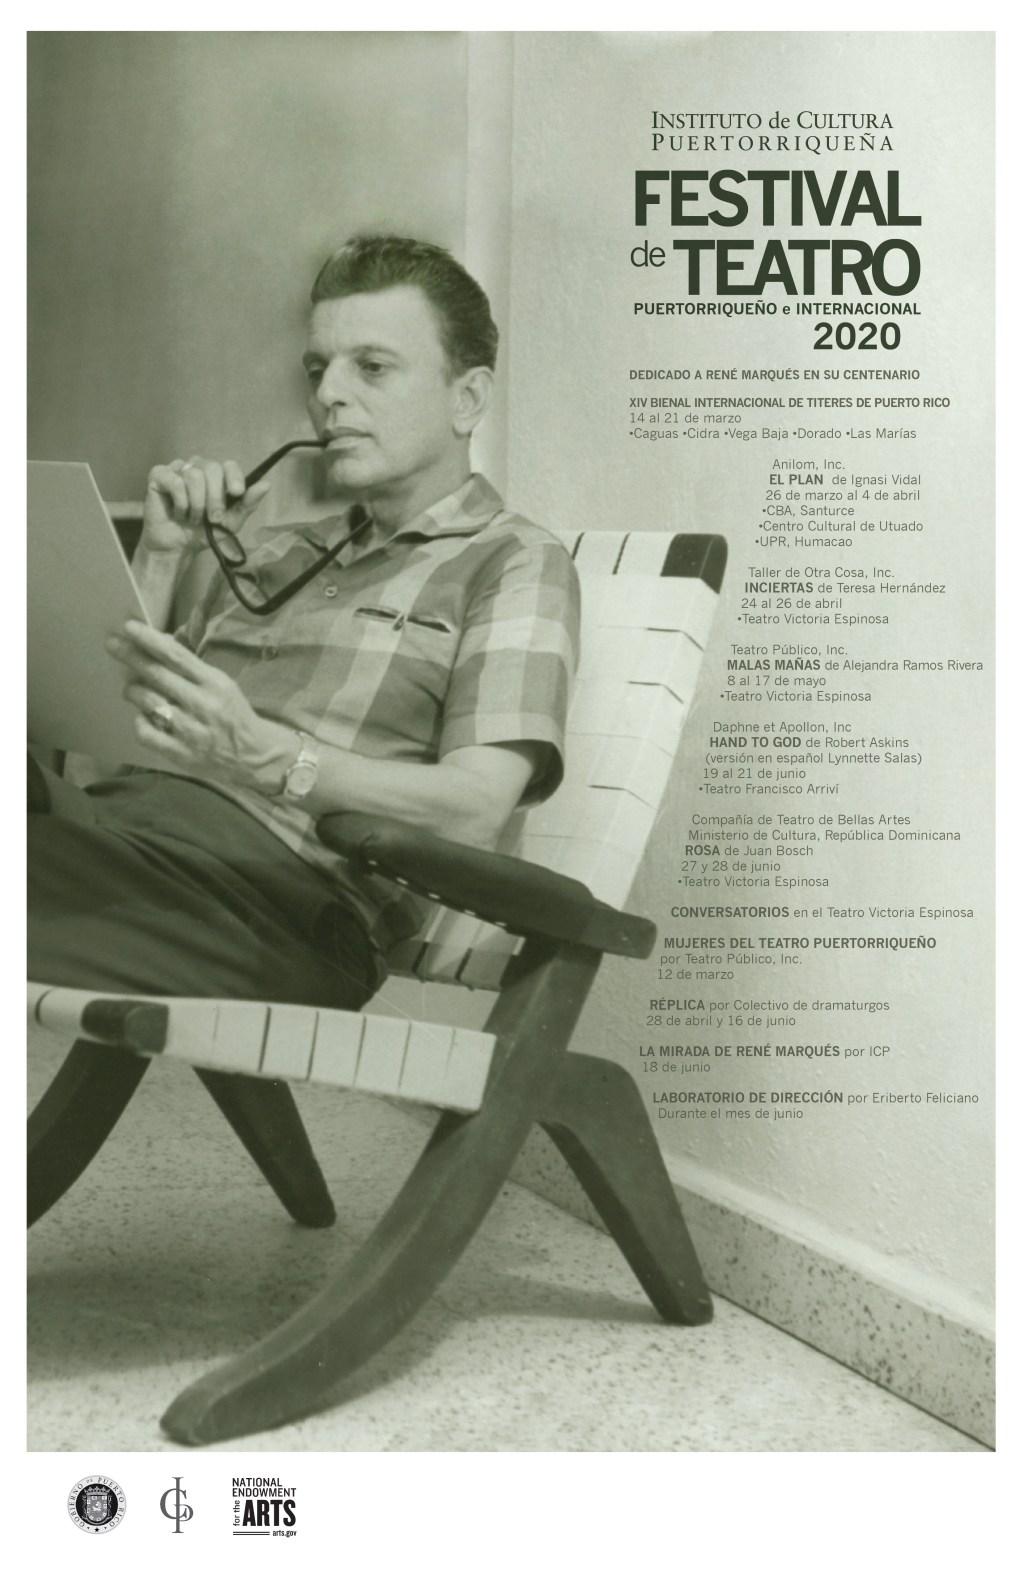 Festival de Teatro Puertorriqueño e Internacional 2020